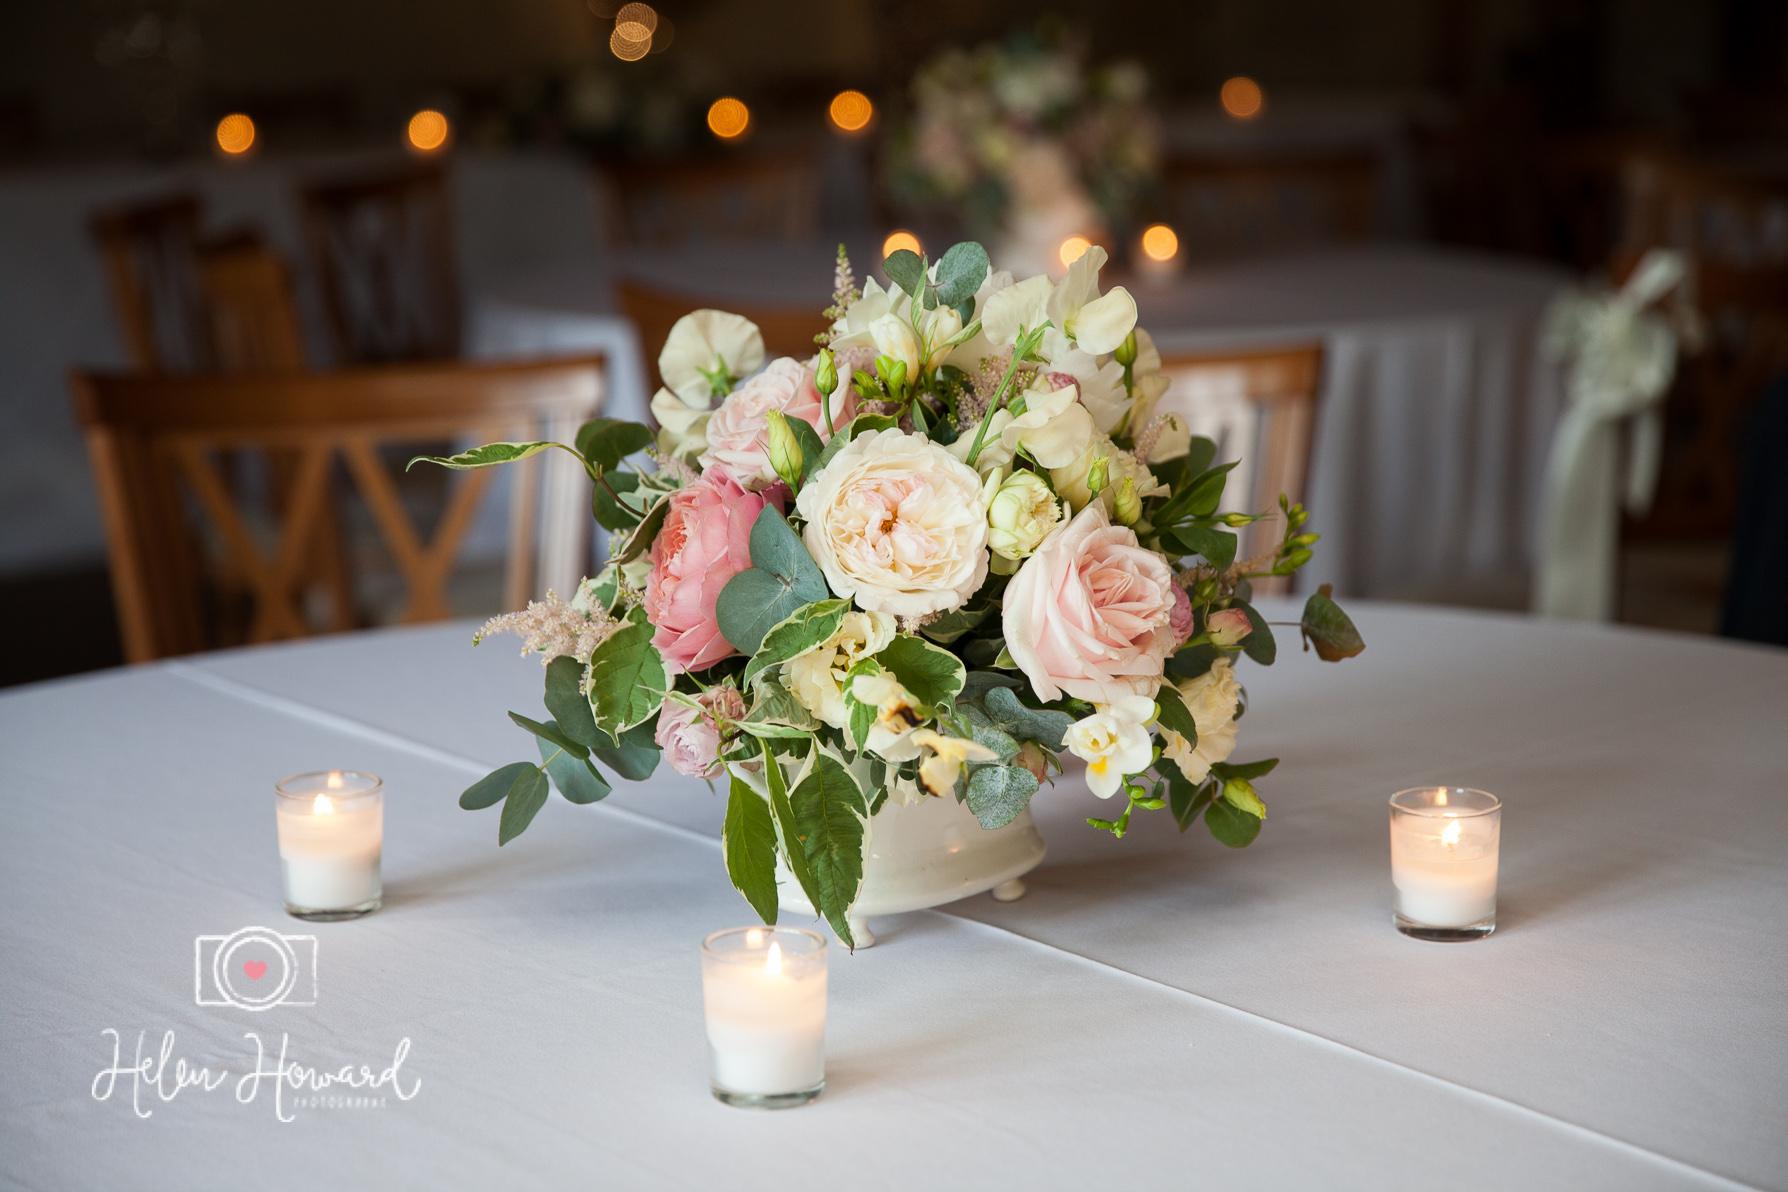 Helen Howard Photography Packington Moor Wedding-117.jpg